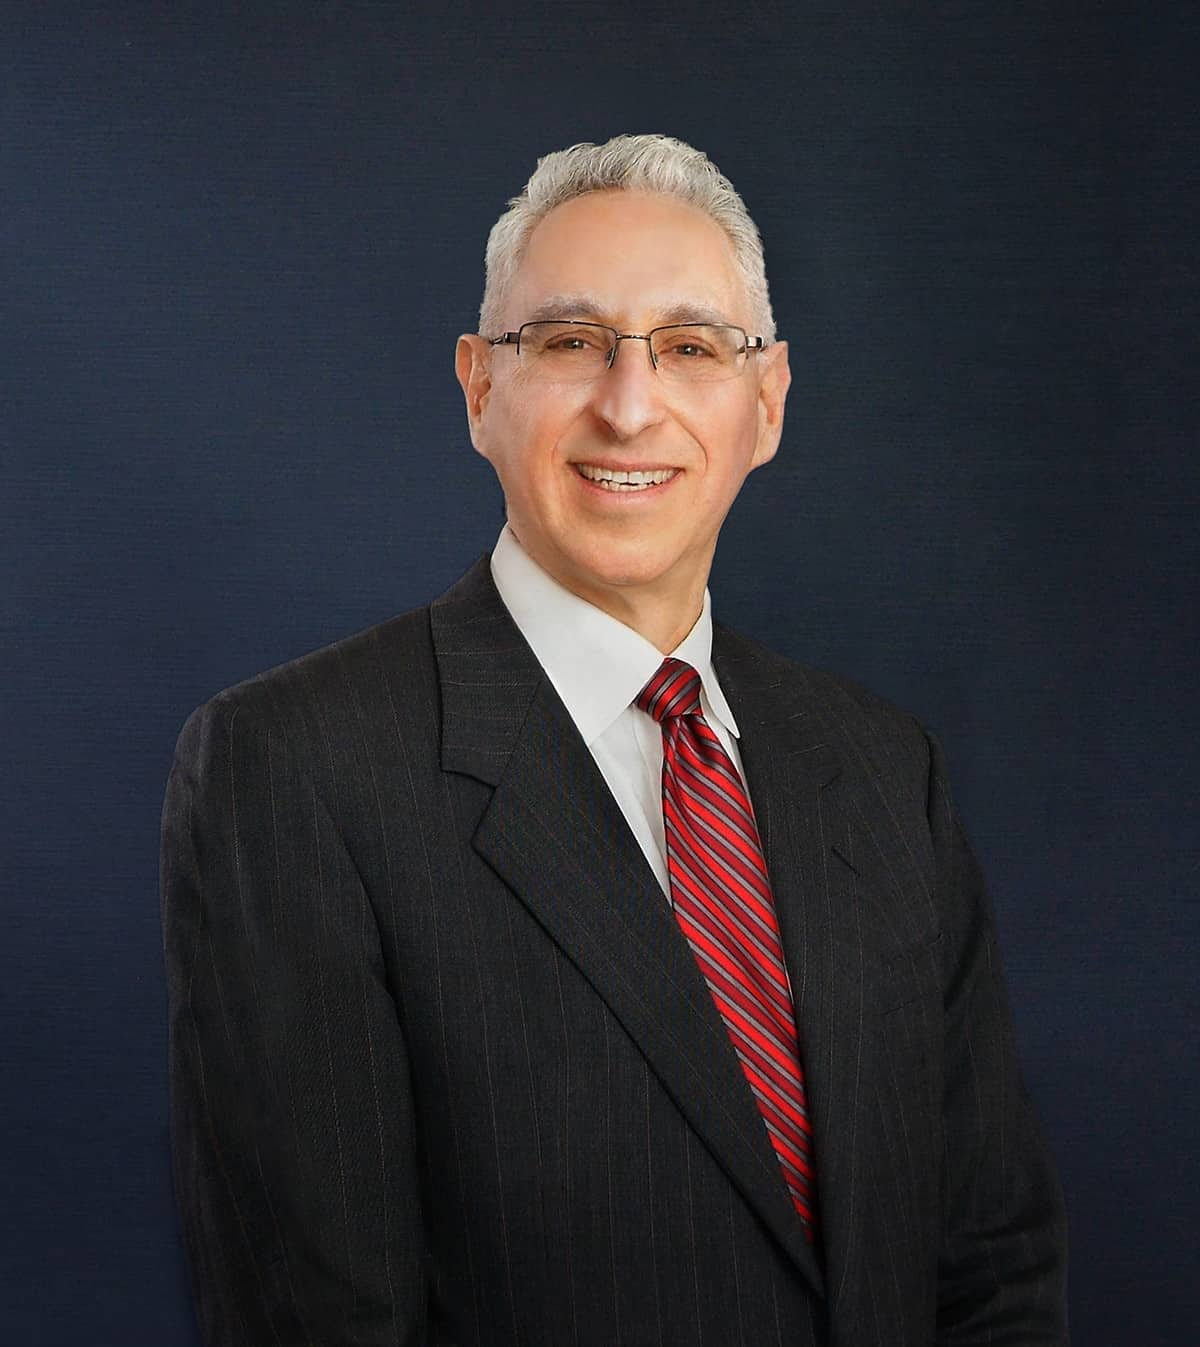 Jay Lebed, PhD